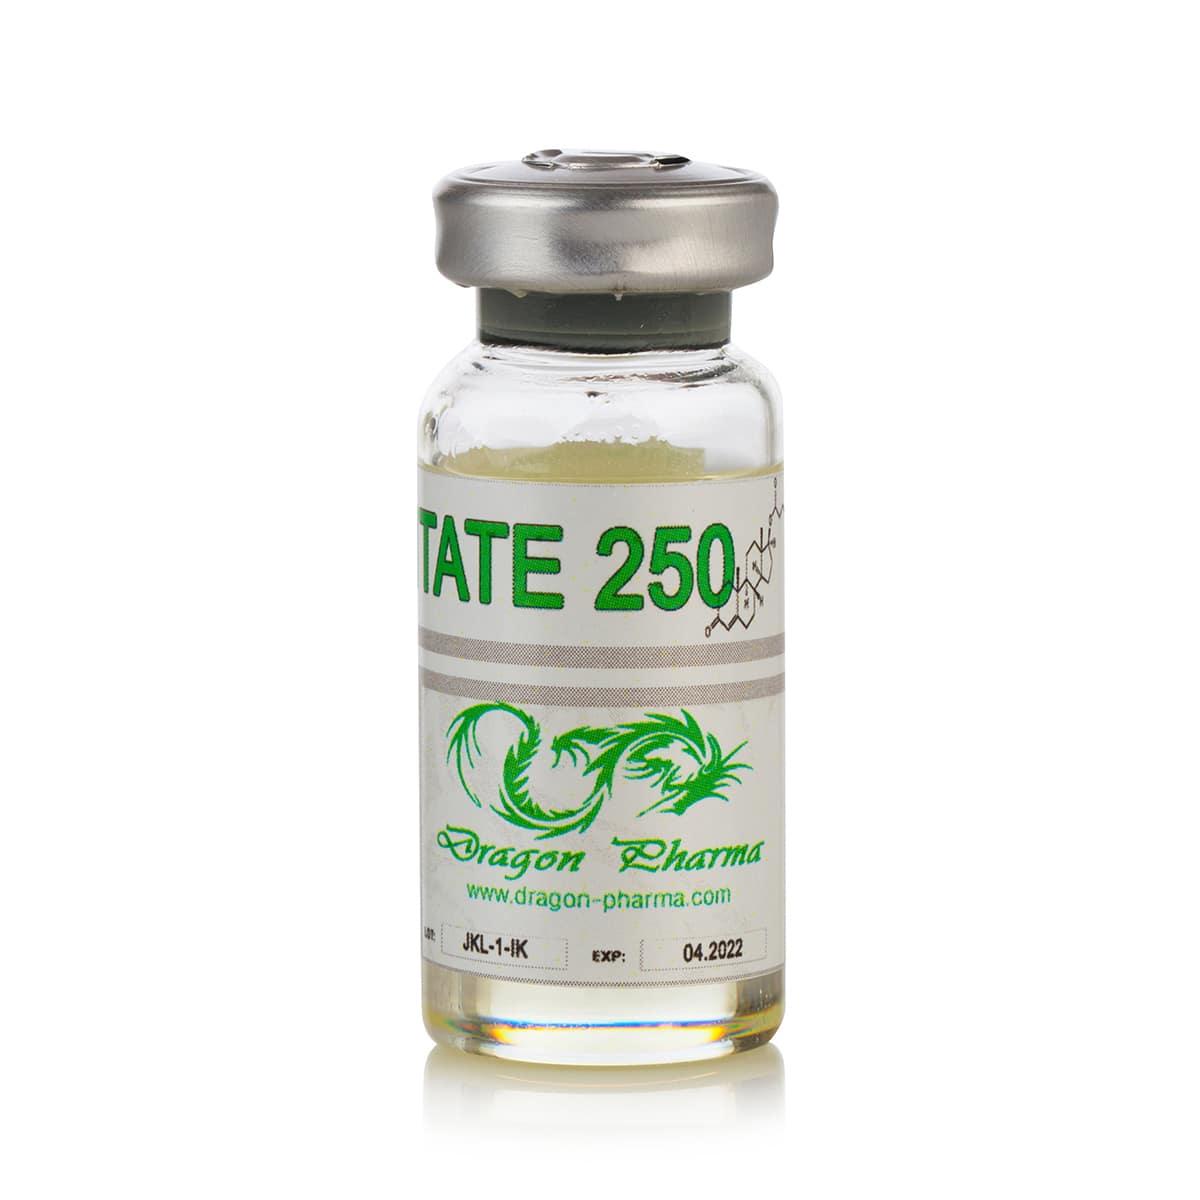 Enantat 250 (Testosterone Enanthate) – 10 мл. х 250 мг.